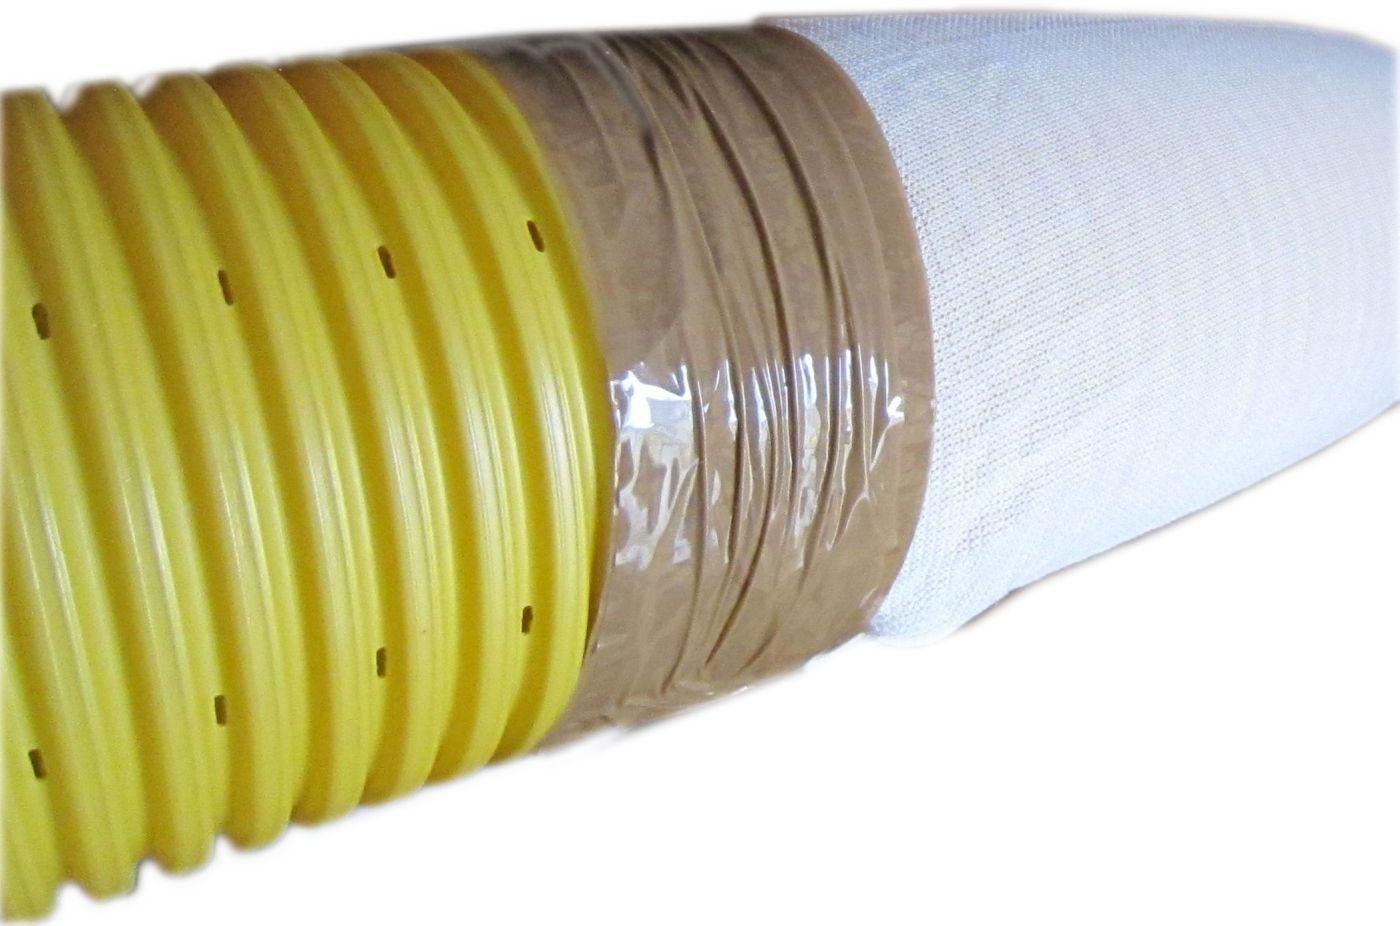 drainagerohr filter set 50m wetzel technische netze. Black Bedroom Furniture Sets. Home Design Ideas